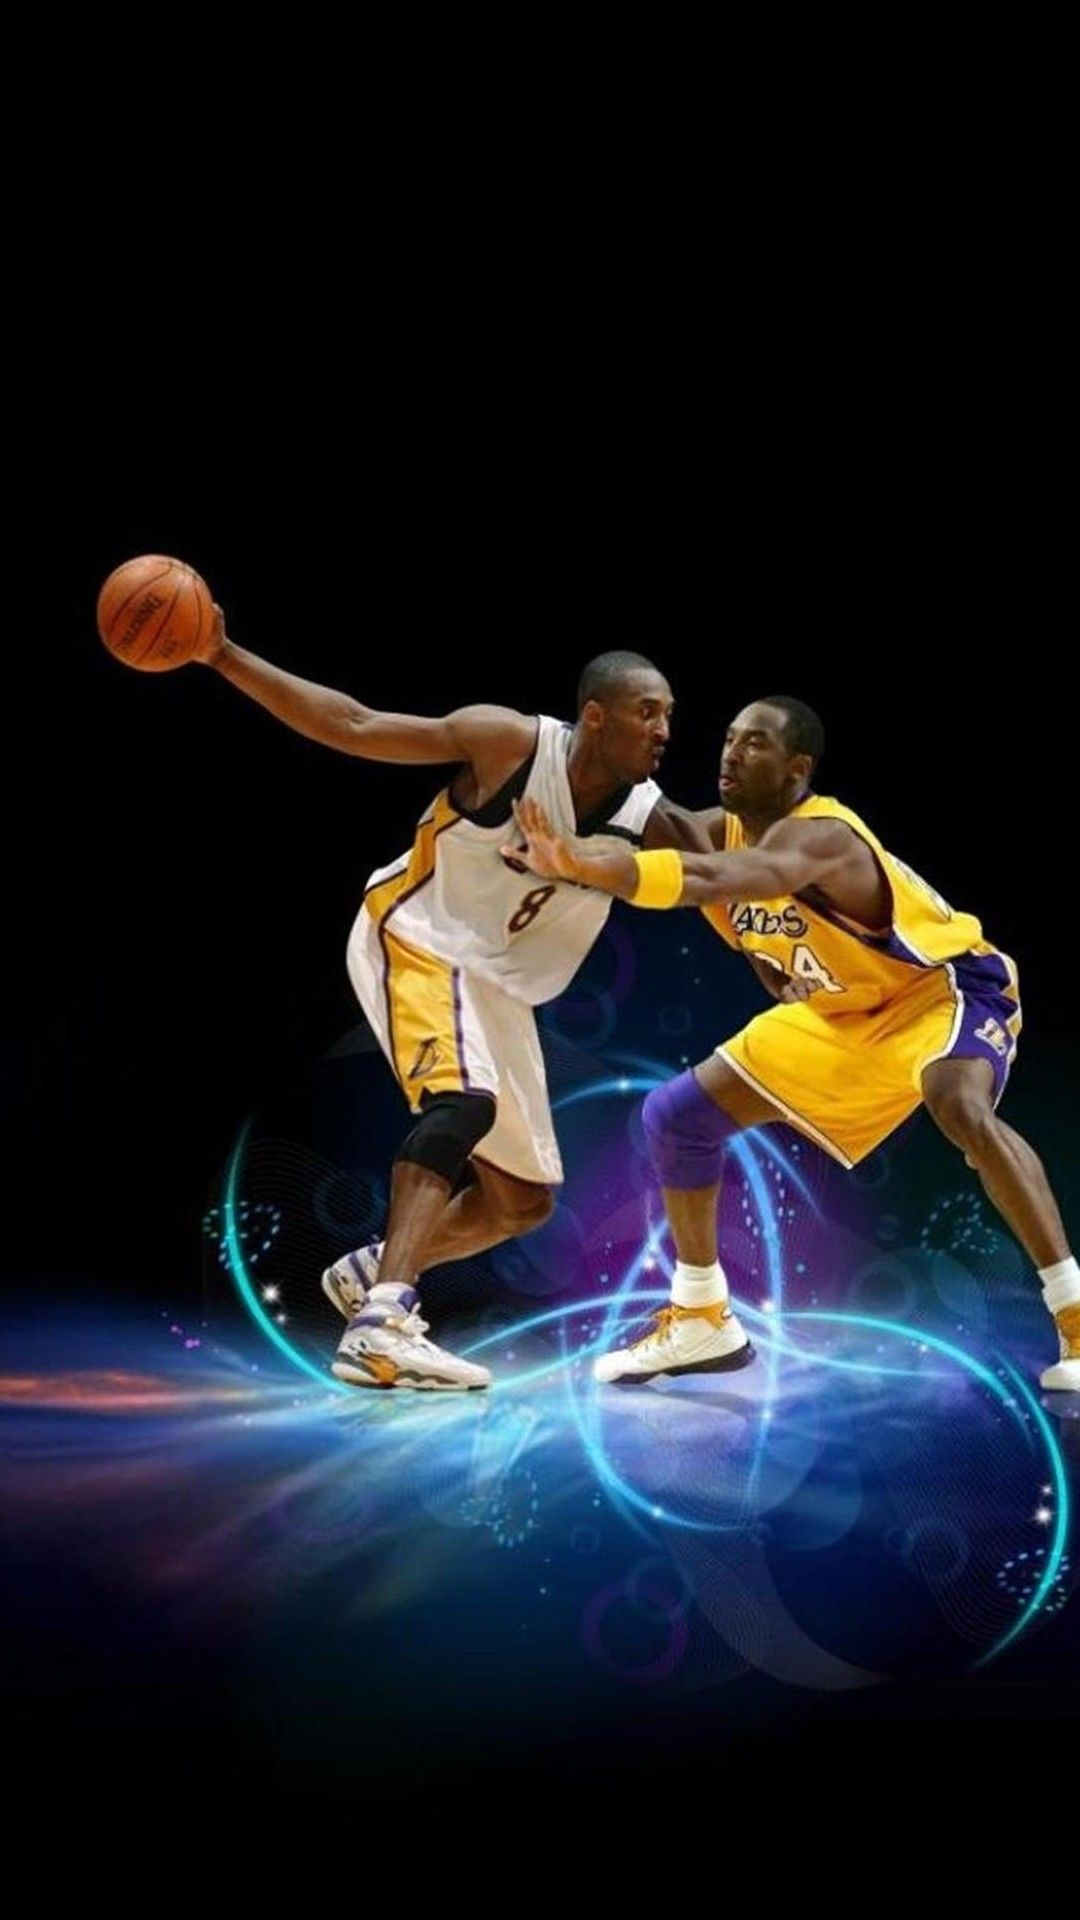 Black Mamba Kobe Bryant Wallpaper Ios In 2020 Kobe Bryant Wallpaper Kobe Bryant Kobe Bryant Pictures